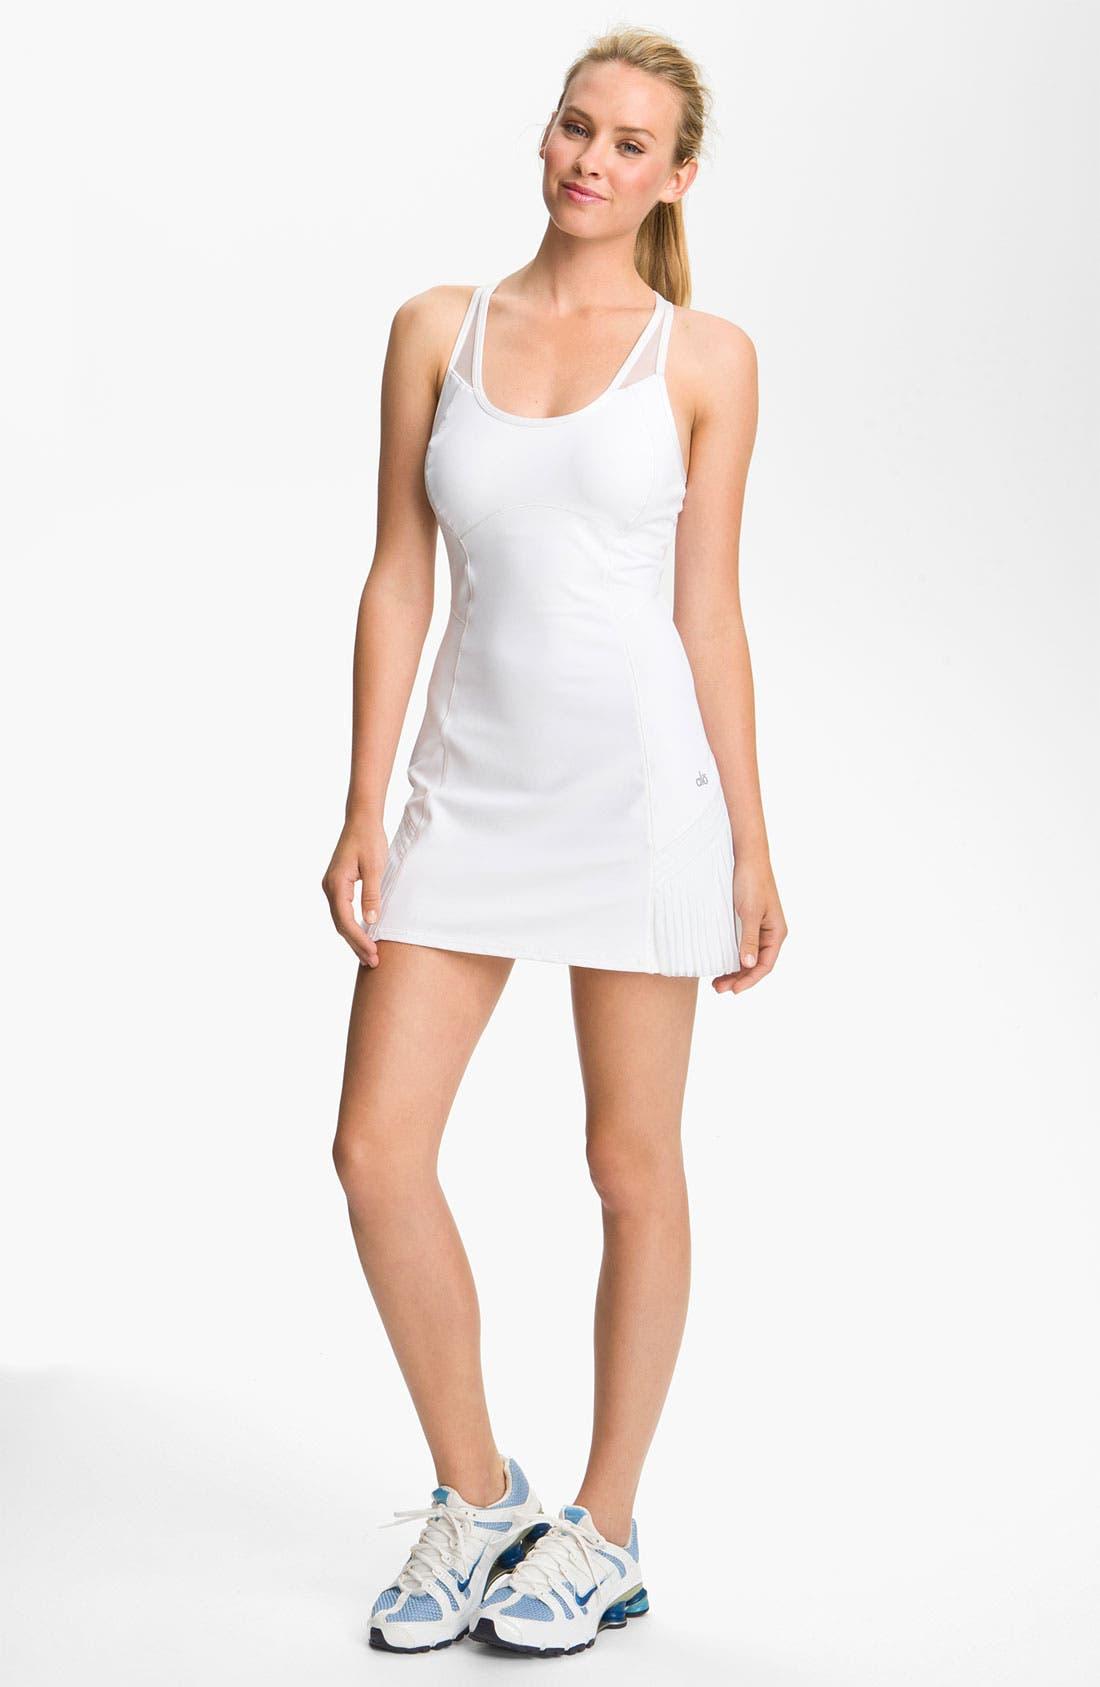 Main Image - Alo 'Best on Court' Dress